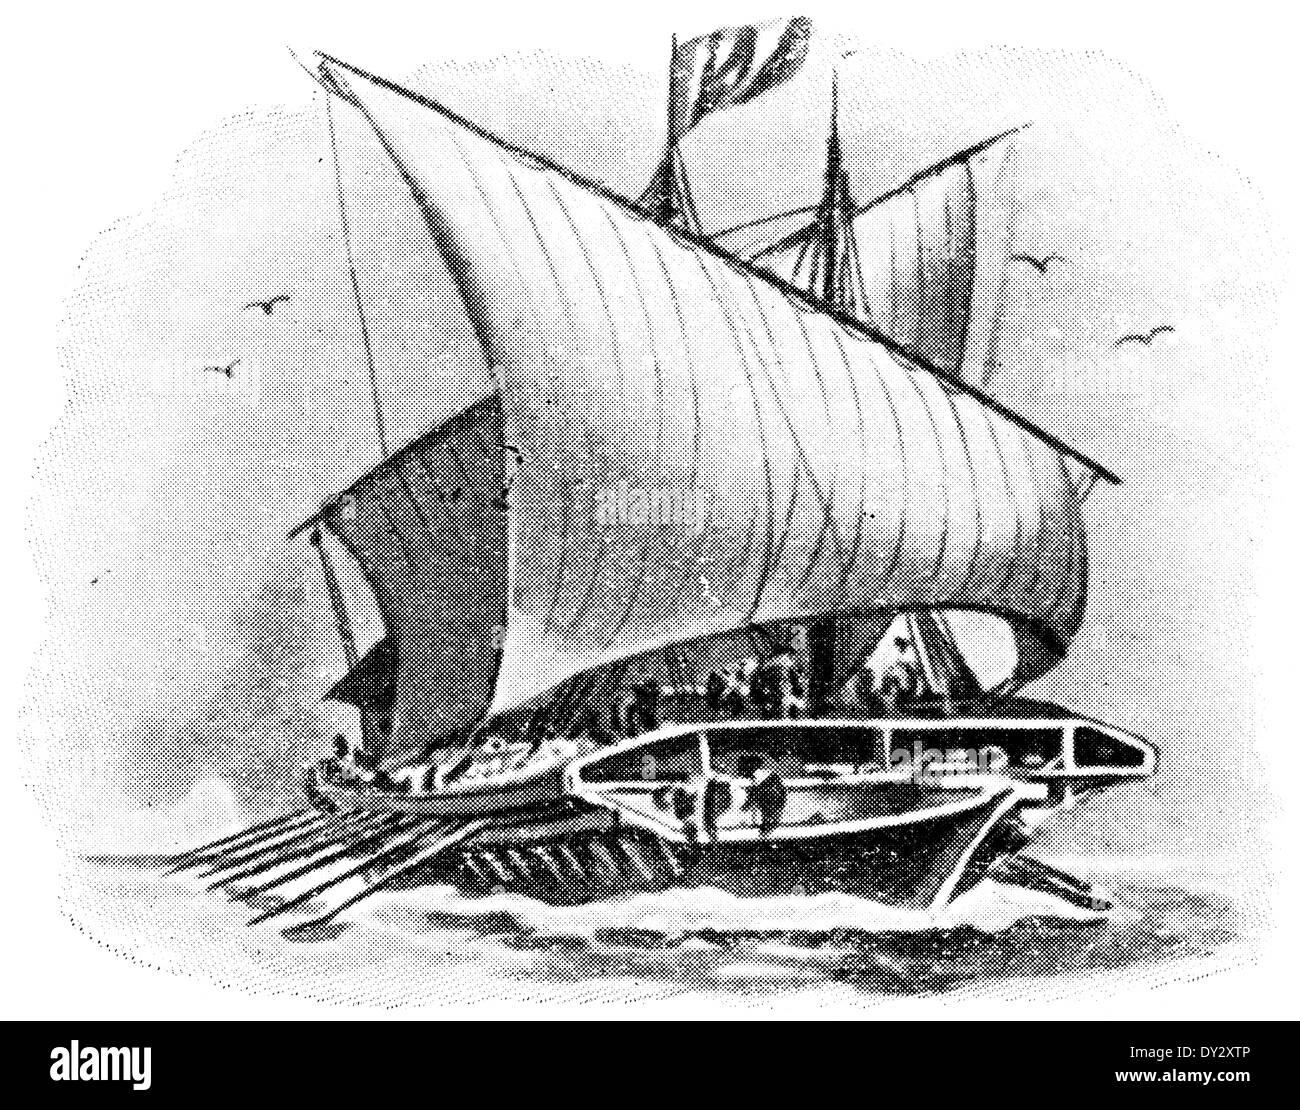 Venetian galley 17th century. - Stock Image